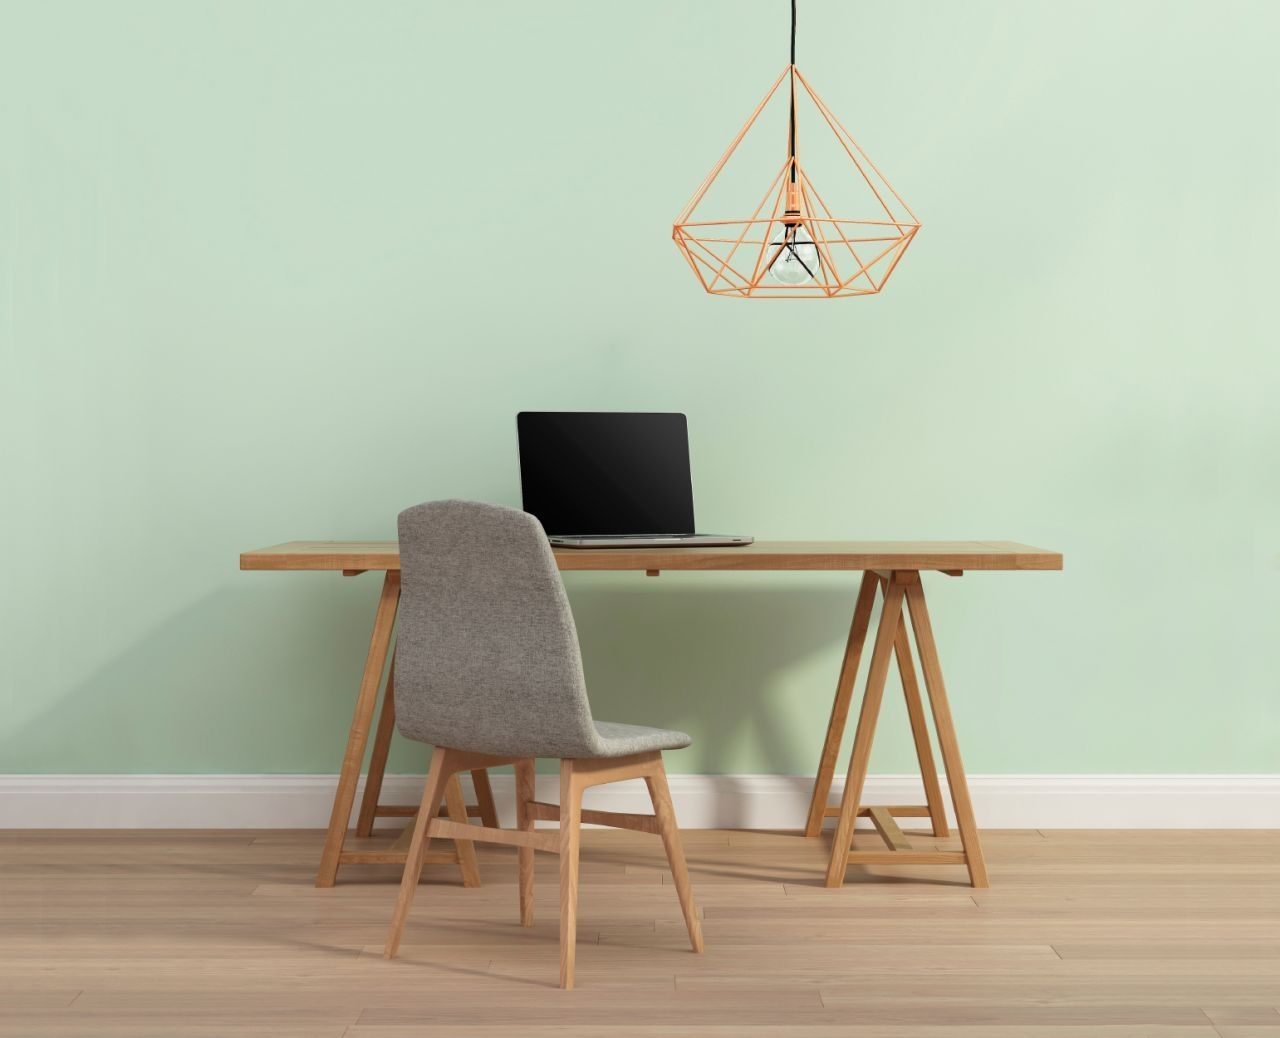 Beautiful Kleur Woonkamer Kiezen Pictures - House Design Ideas 2018 ...